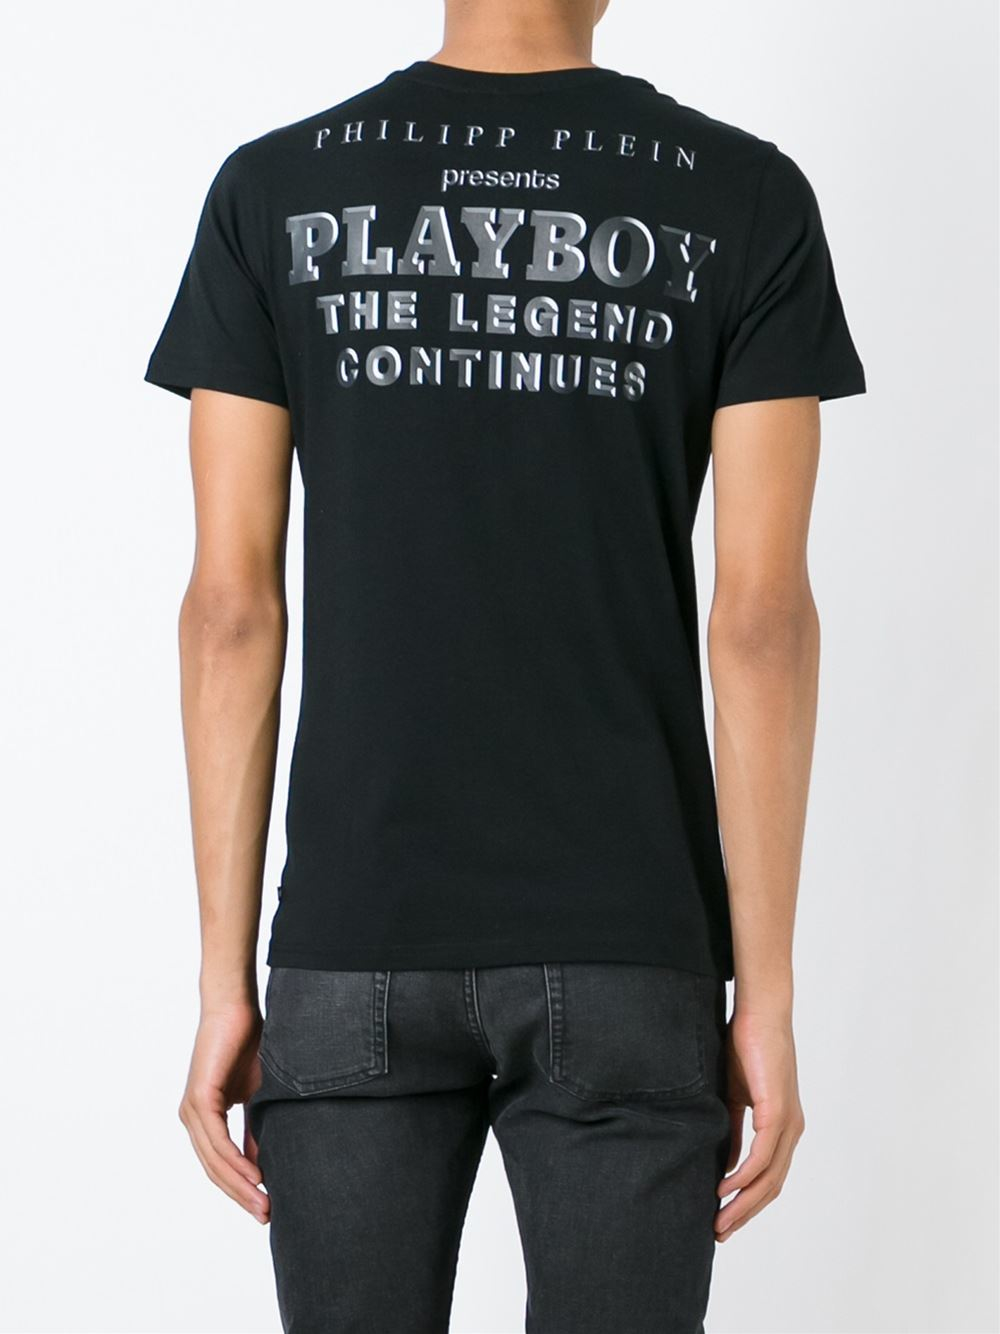 Alabama T Shirts For Women